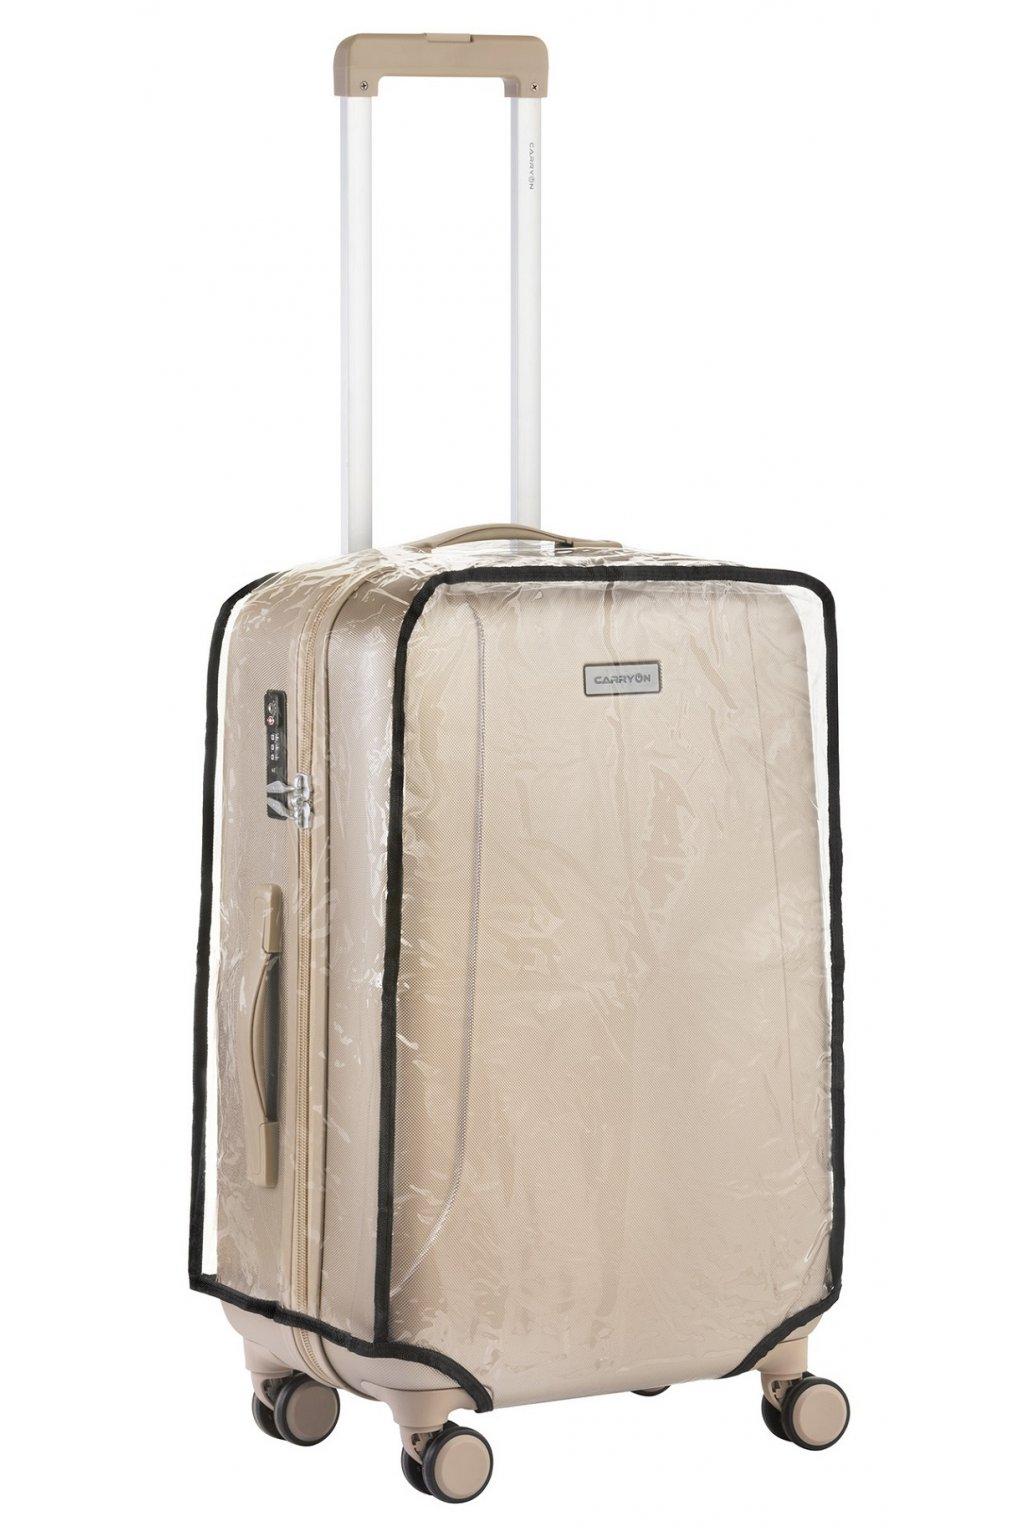 kufrland carryon transparentmedium obal na kufry (1)